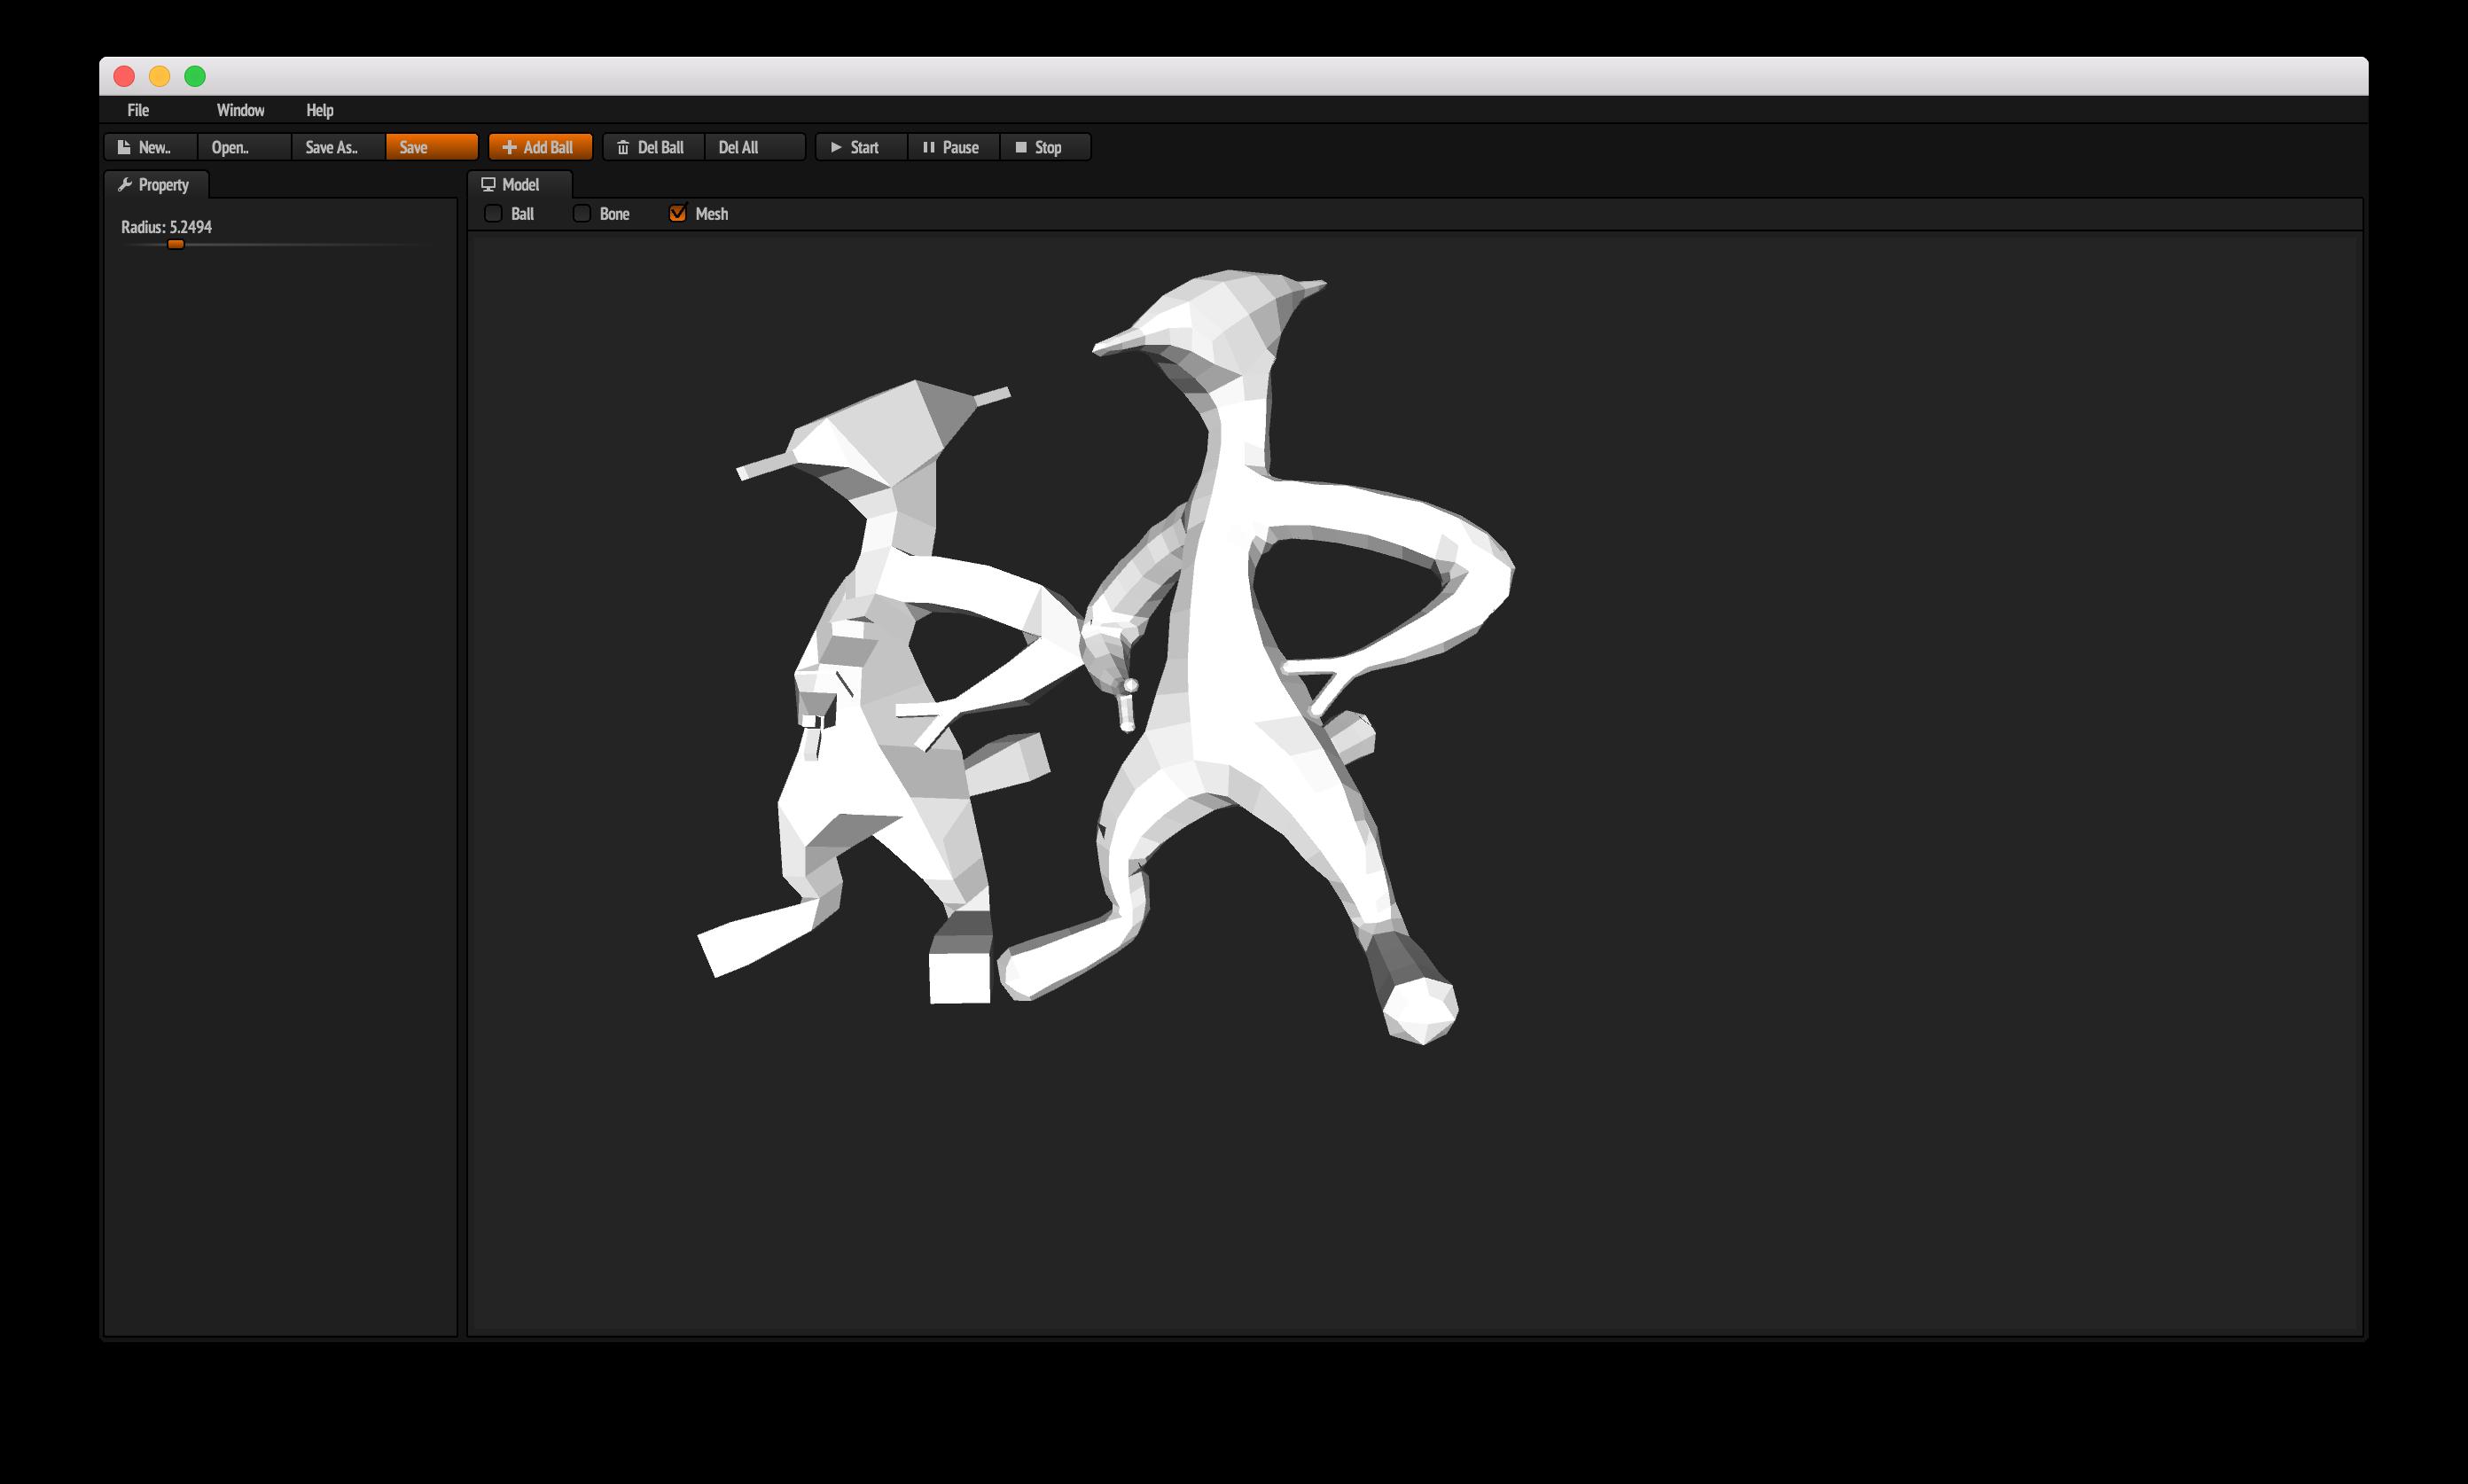 https://raw.githubusercontent.com/huxingyi/dust3d/331889ece938c463f449a226fc353e26ed39d6bc/screenshot/dust3d_glw_preview_dark_2.png